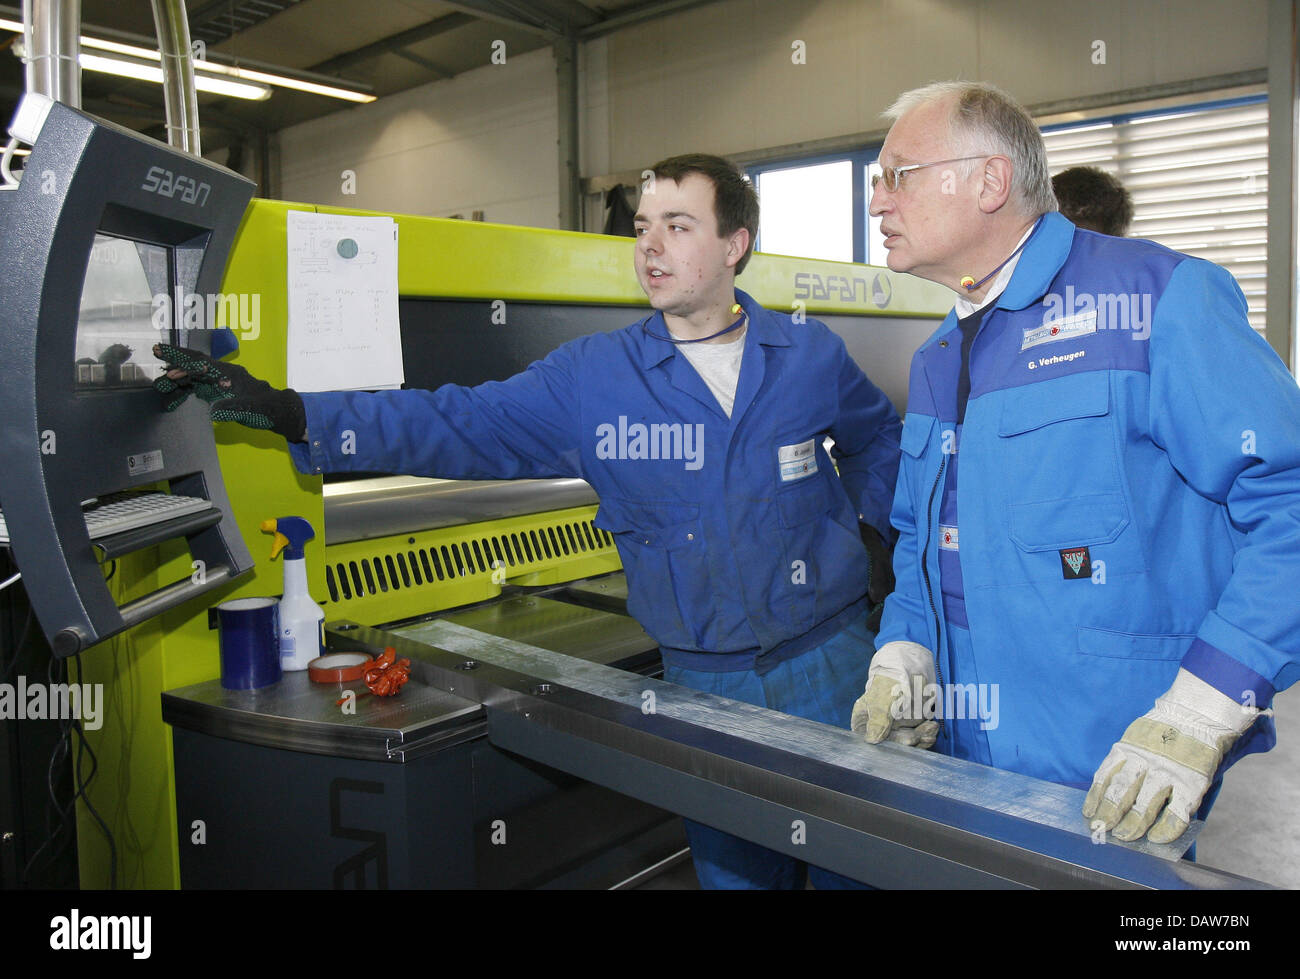 Apprentice Bianco Jagielski (L) explains a sheet metal folding machine to the Euopean Commissioner for Enterprise - Stock Image